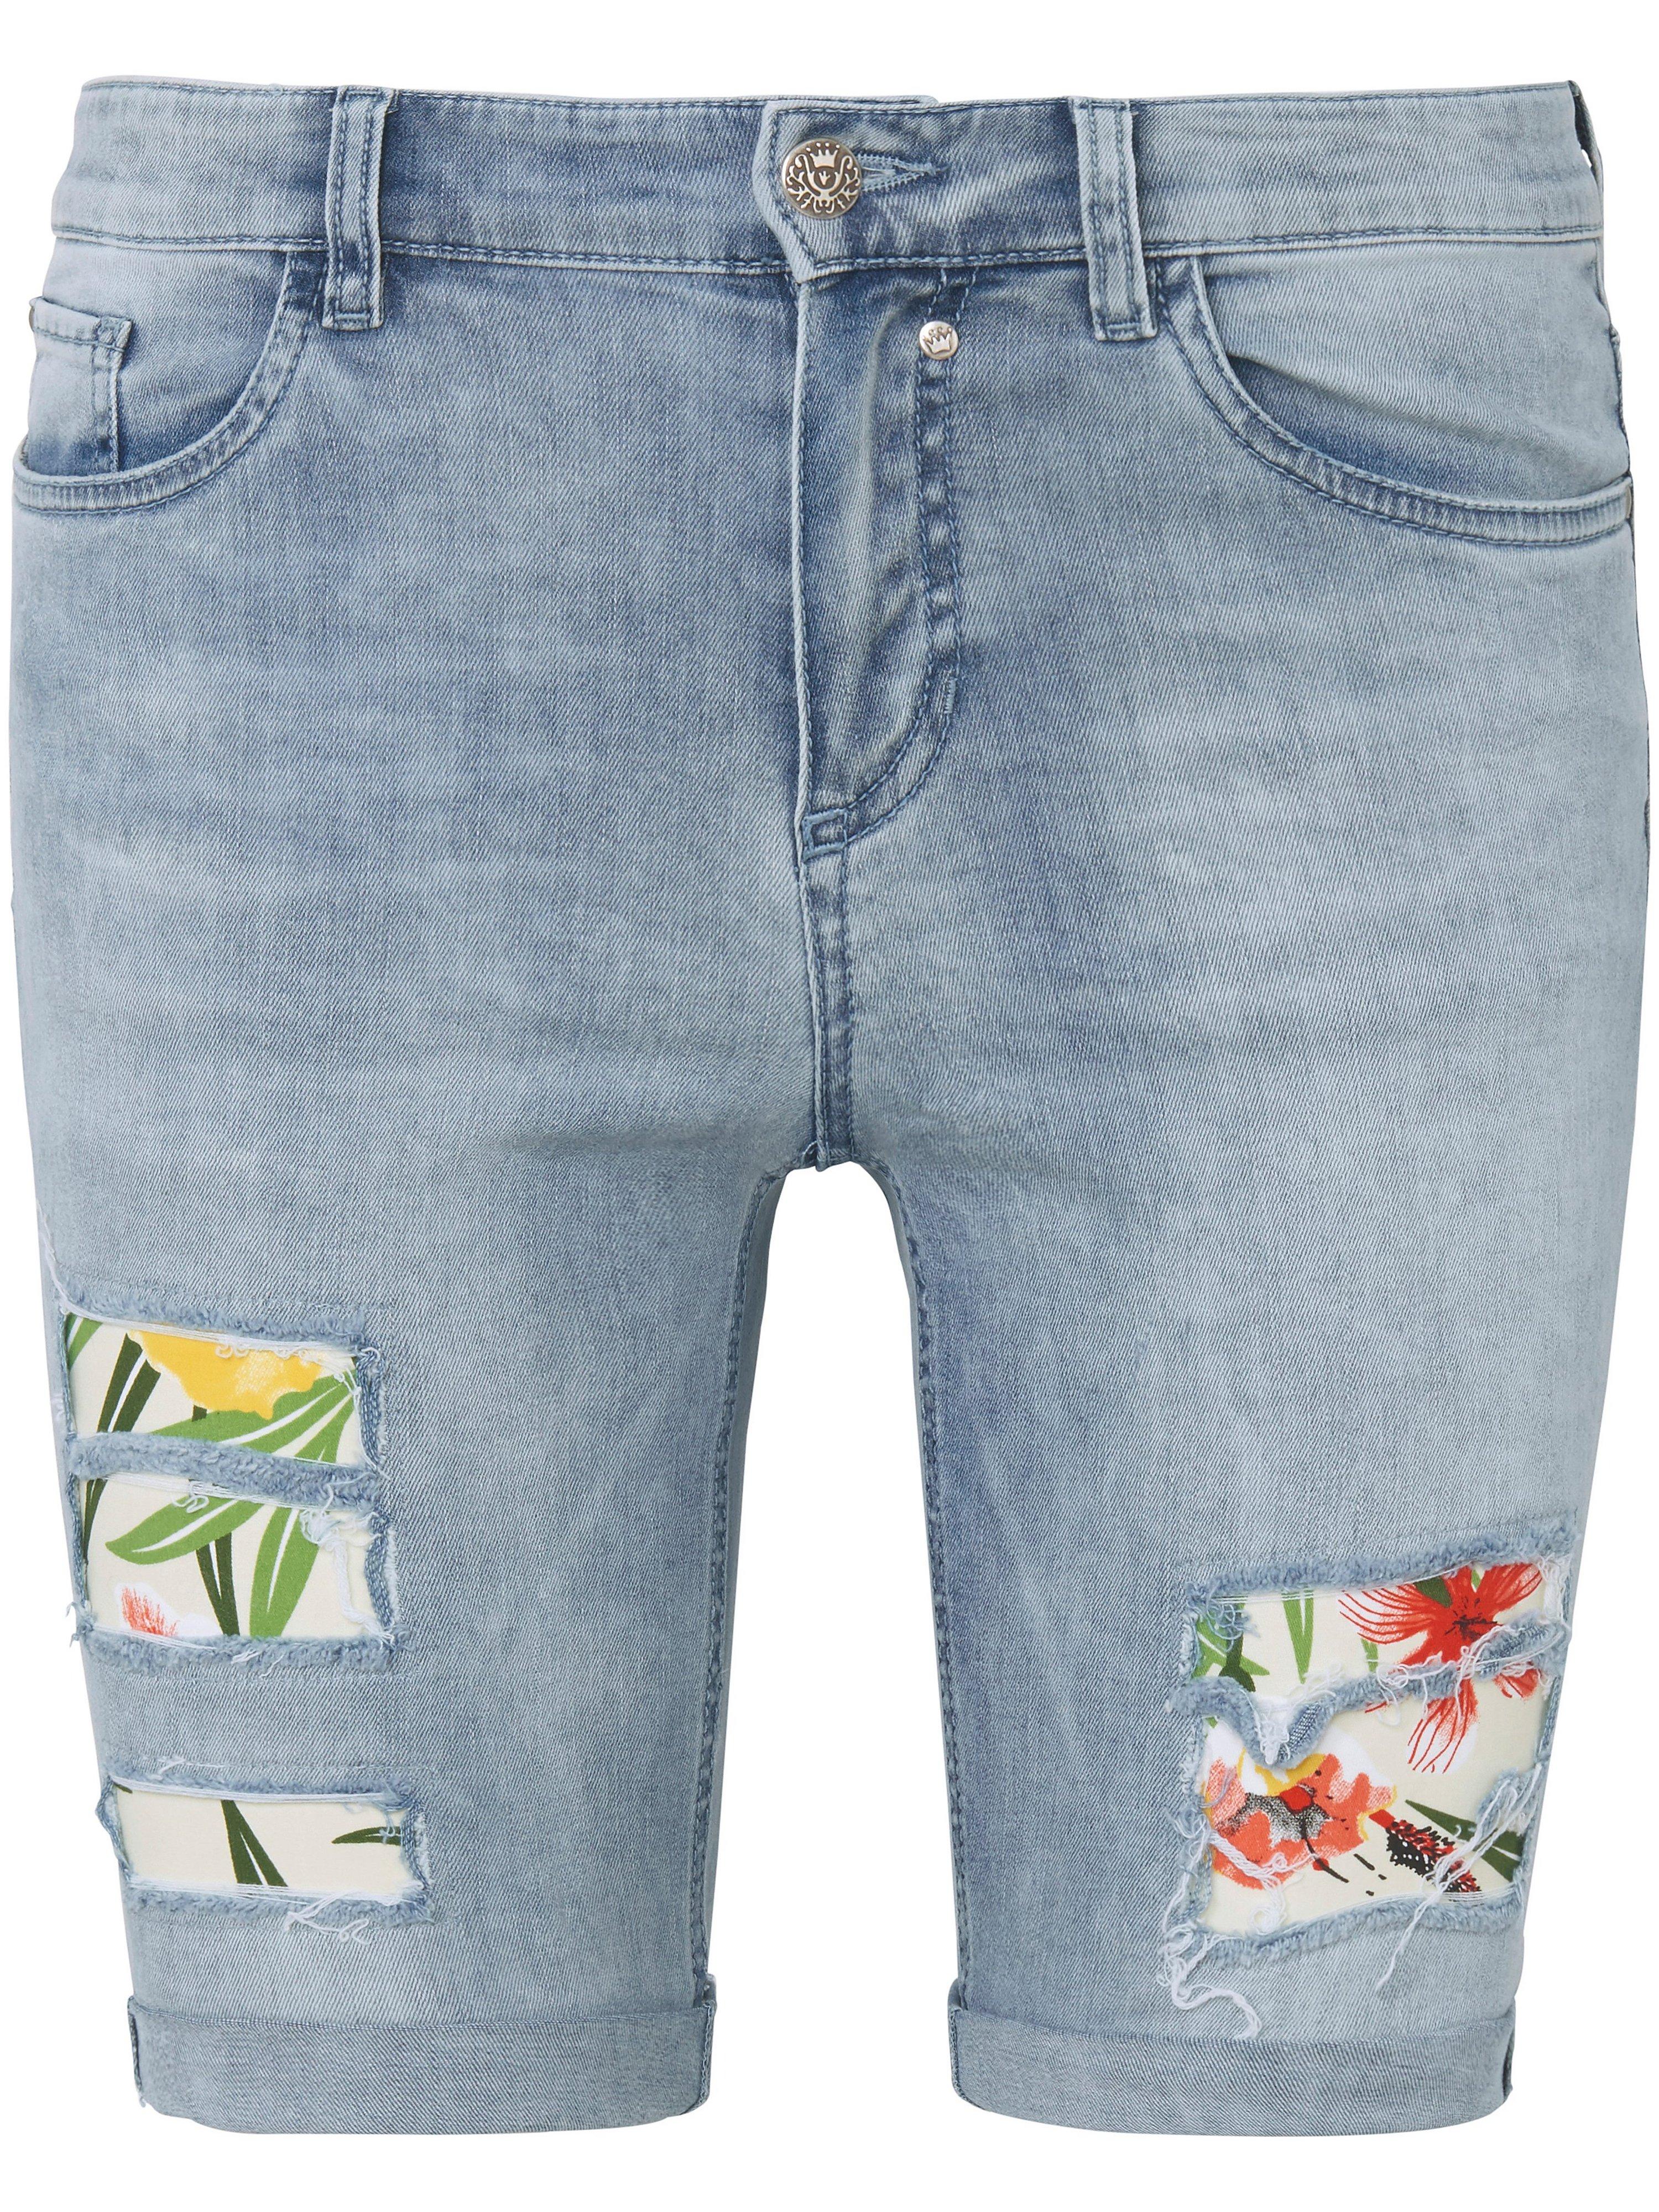 Le bermuda jean modèle Gina  Glücksmoment denim taille 46